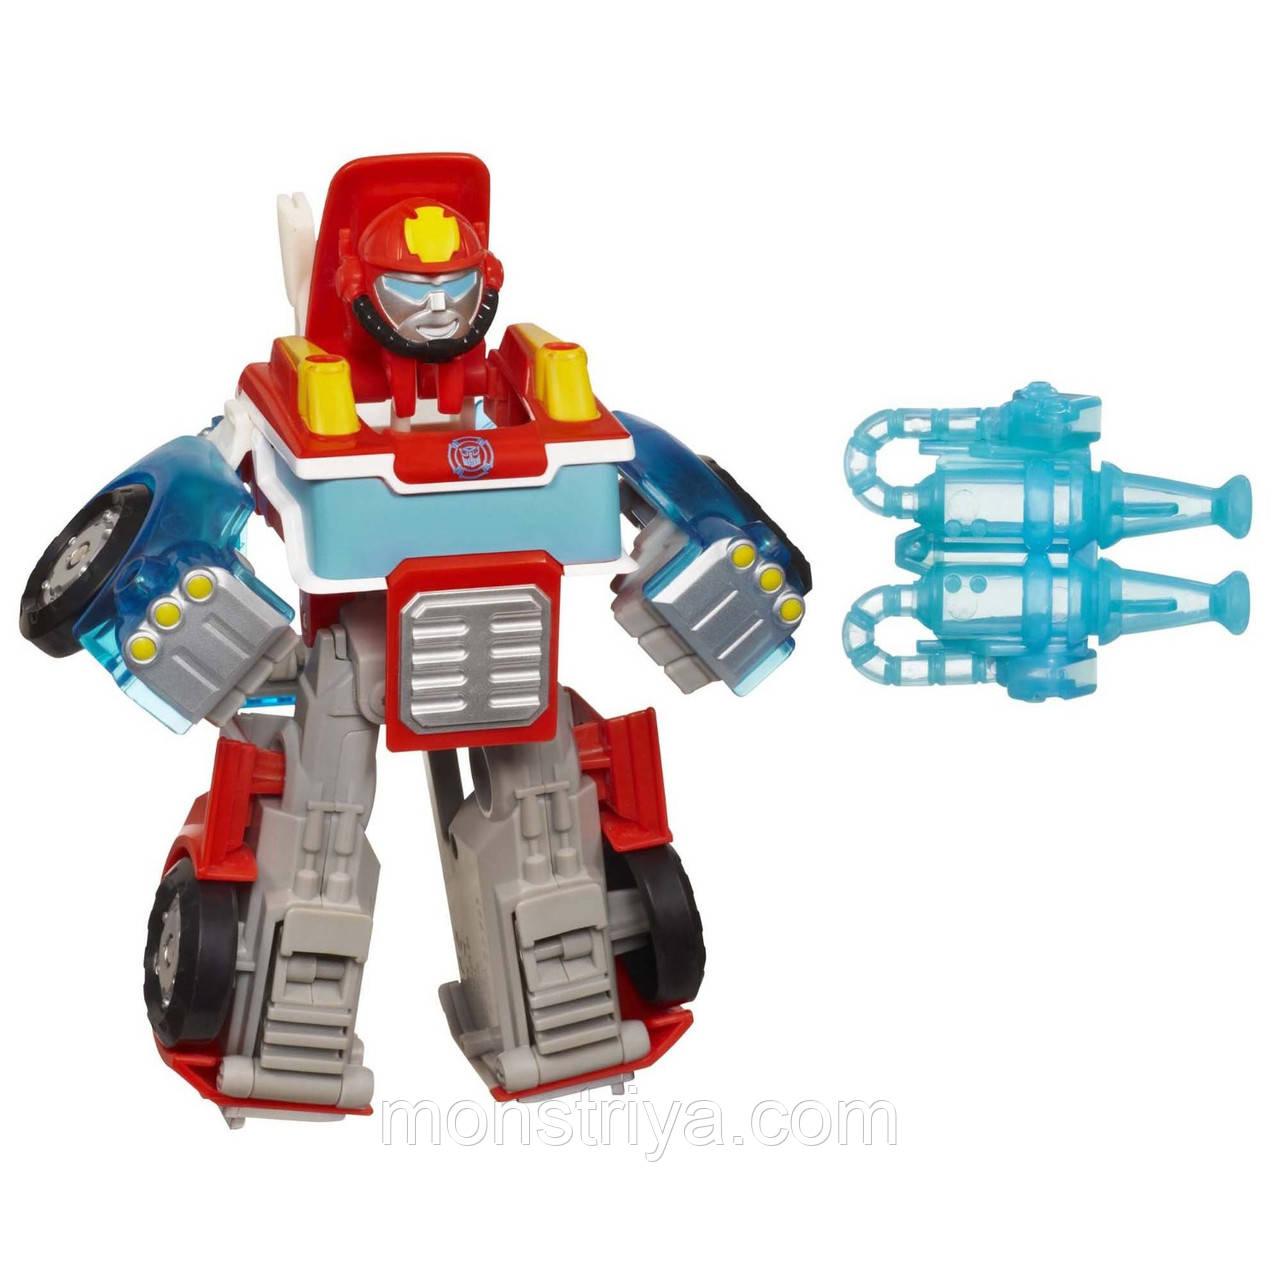 Хитвейв Боты Спасатели Hasbro Transformers